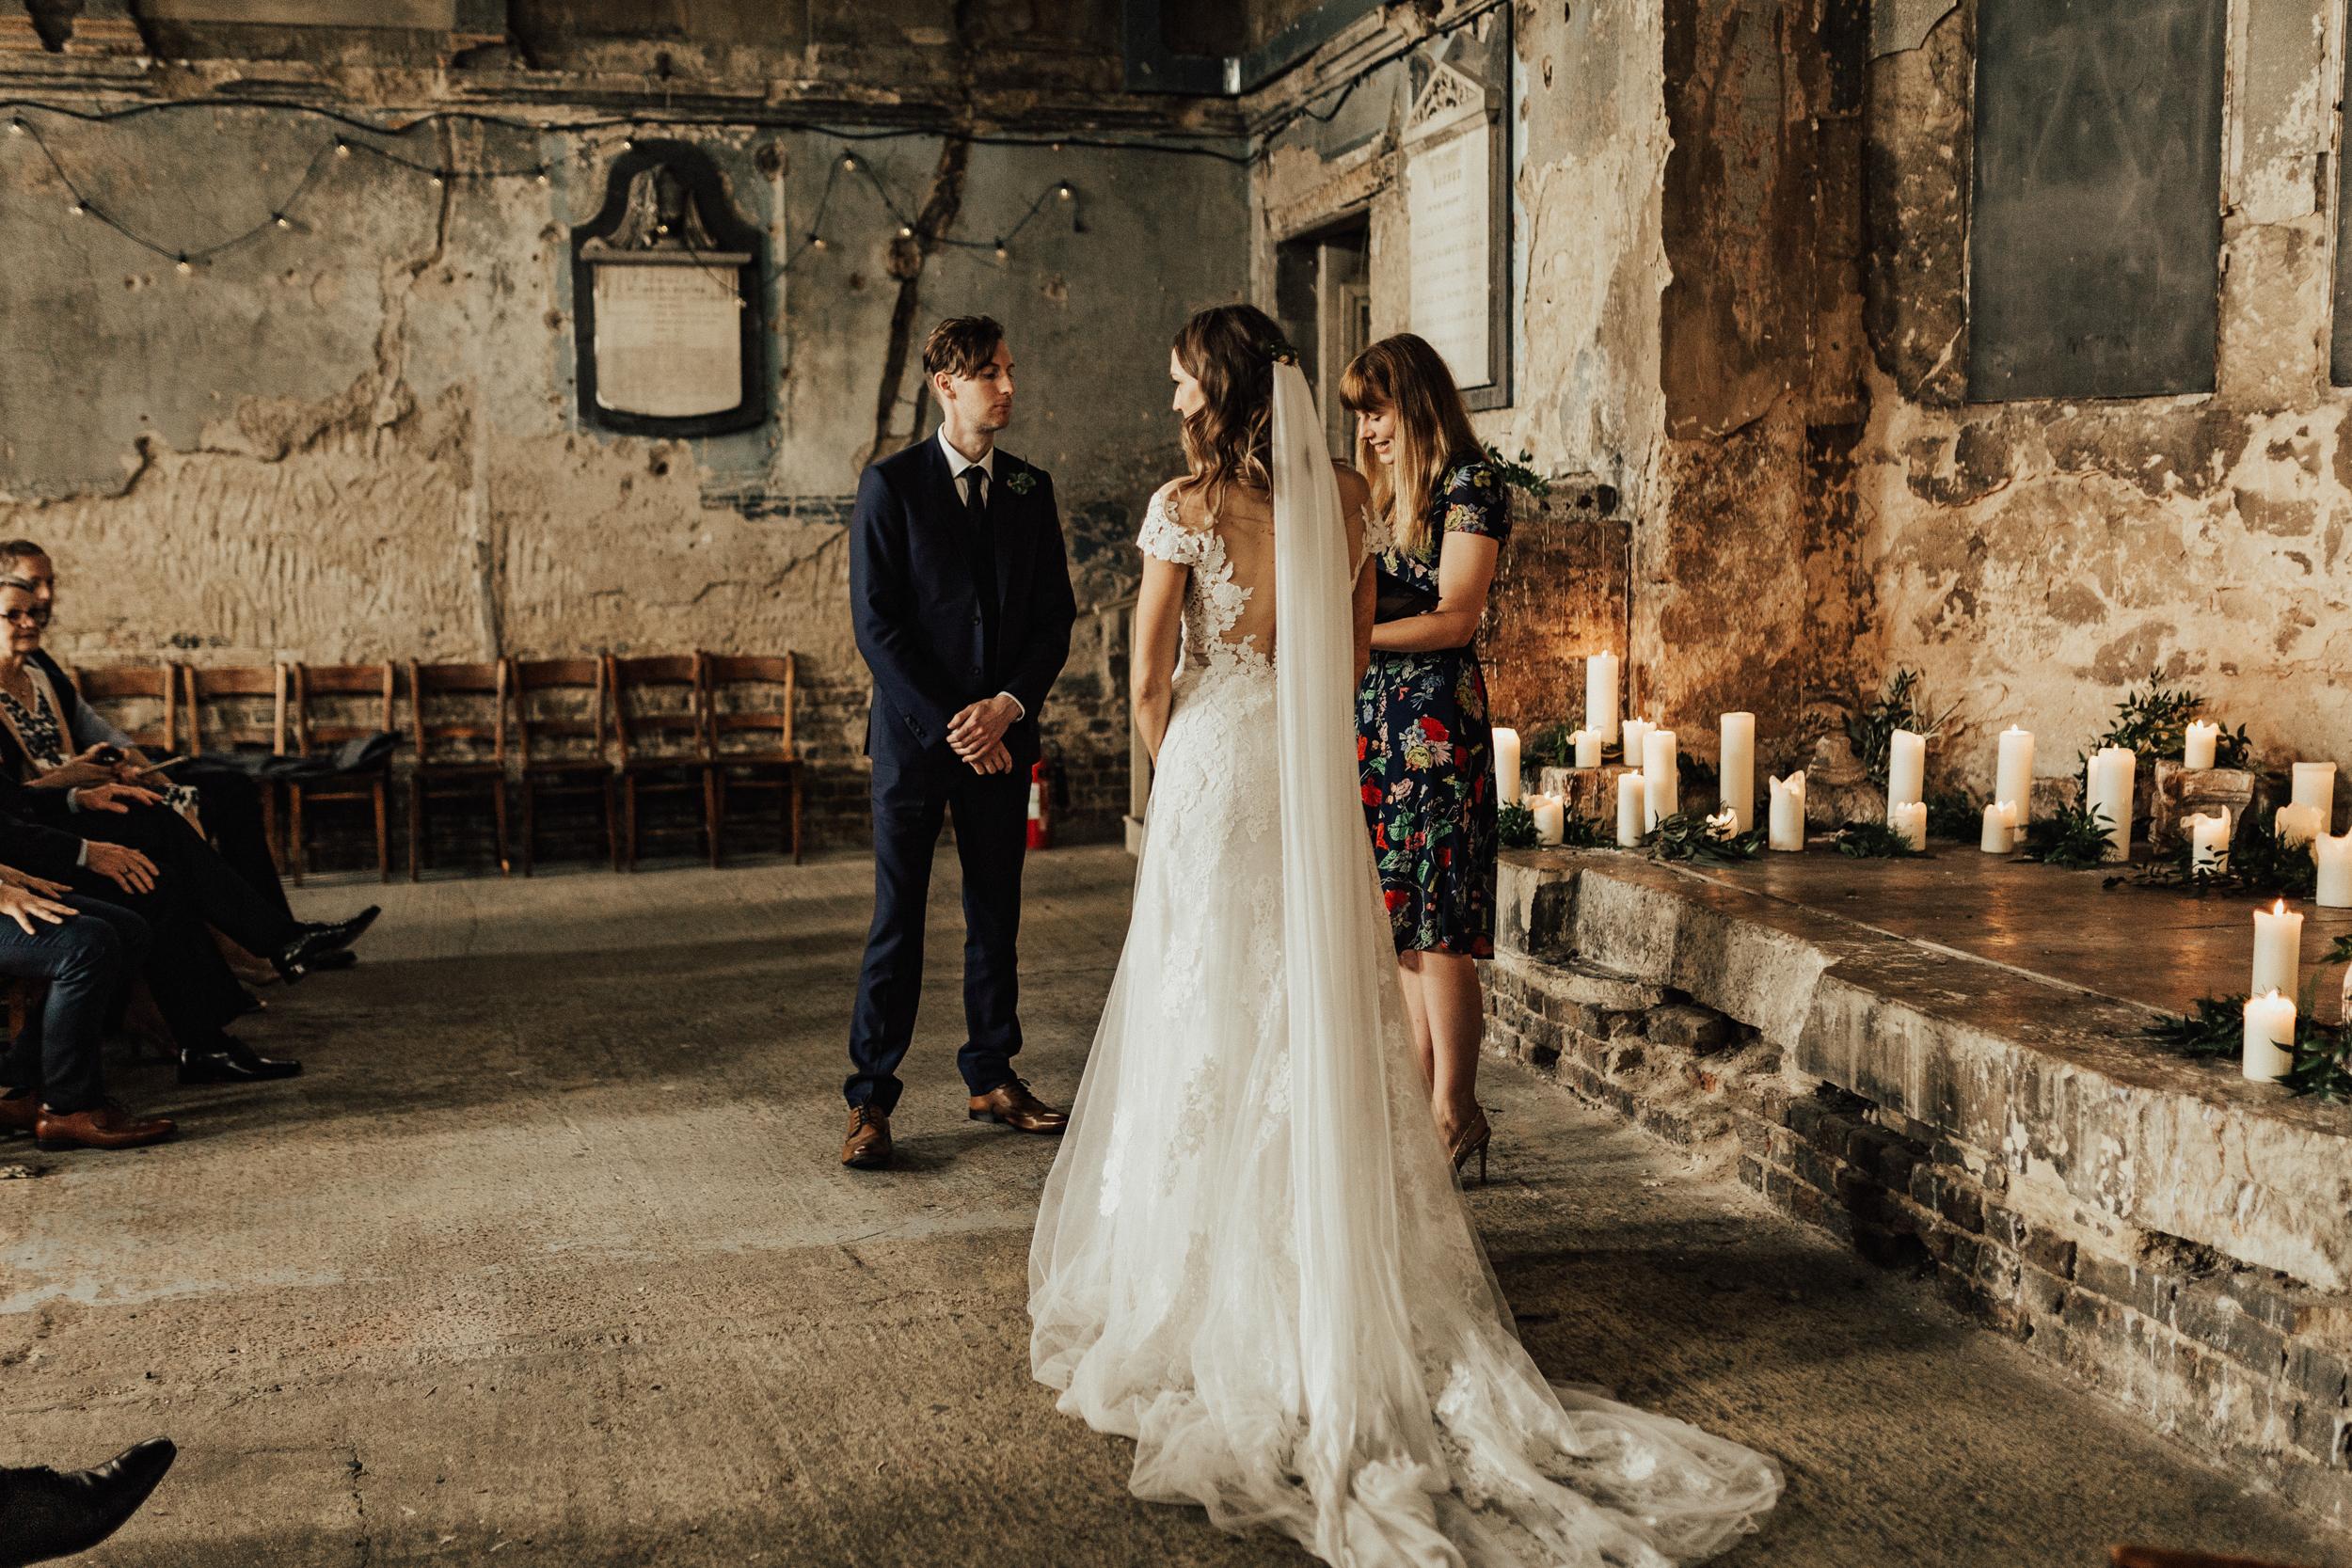 Laura-Benn-The-Asylum-London-The-Ace-Hotel-Wedding-Alternative-Darina-Stoda-Photography-189.jpg